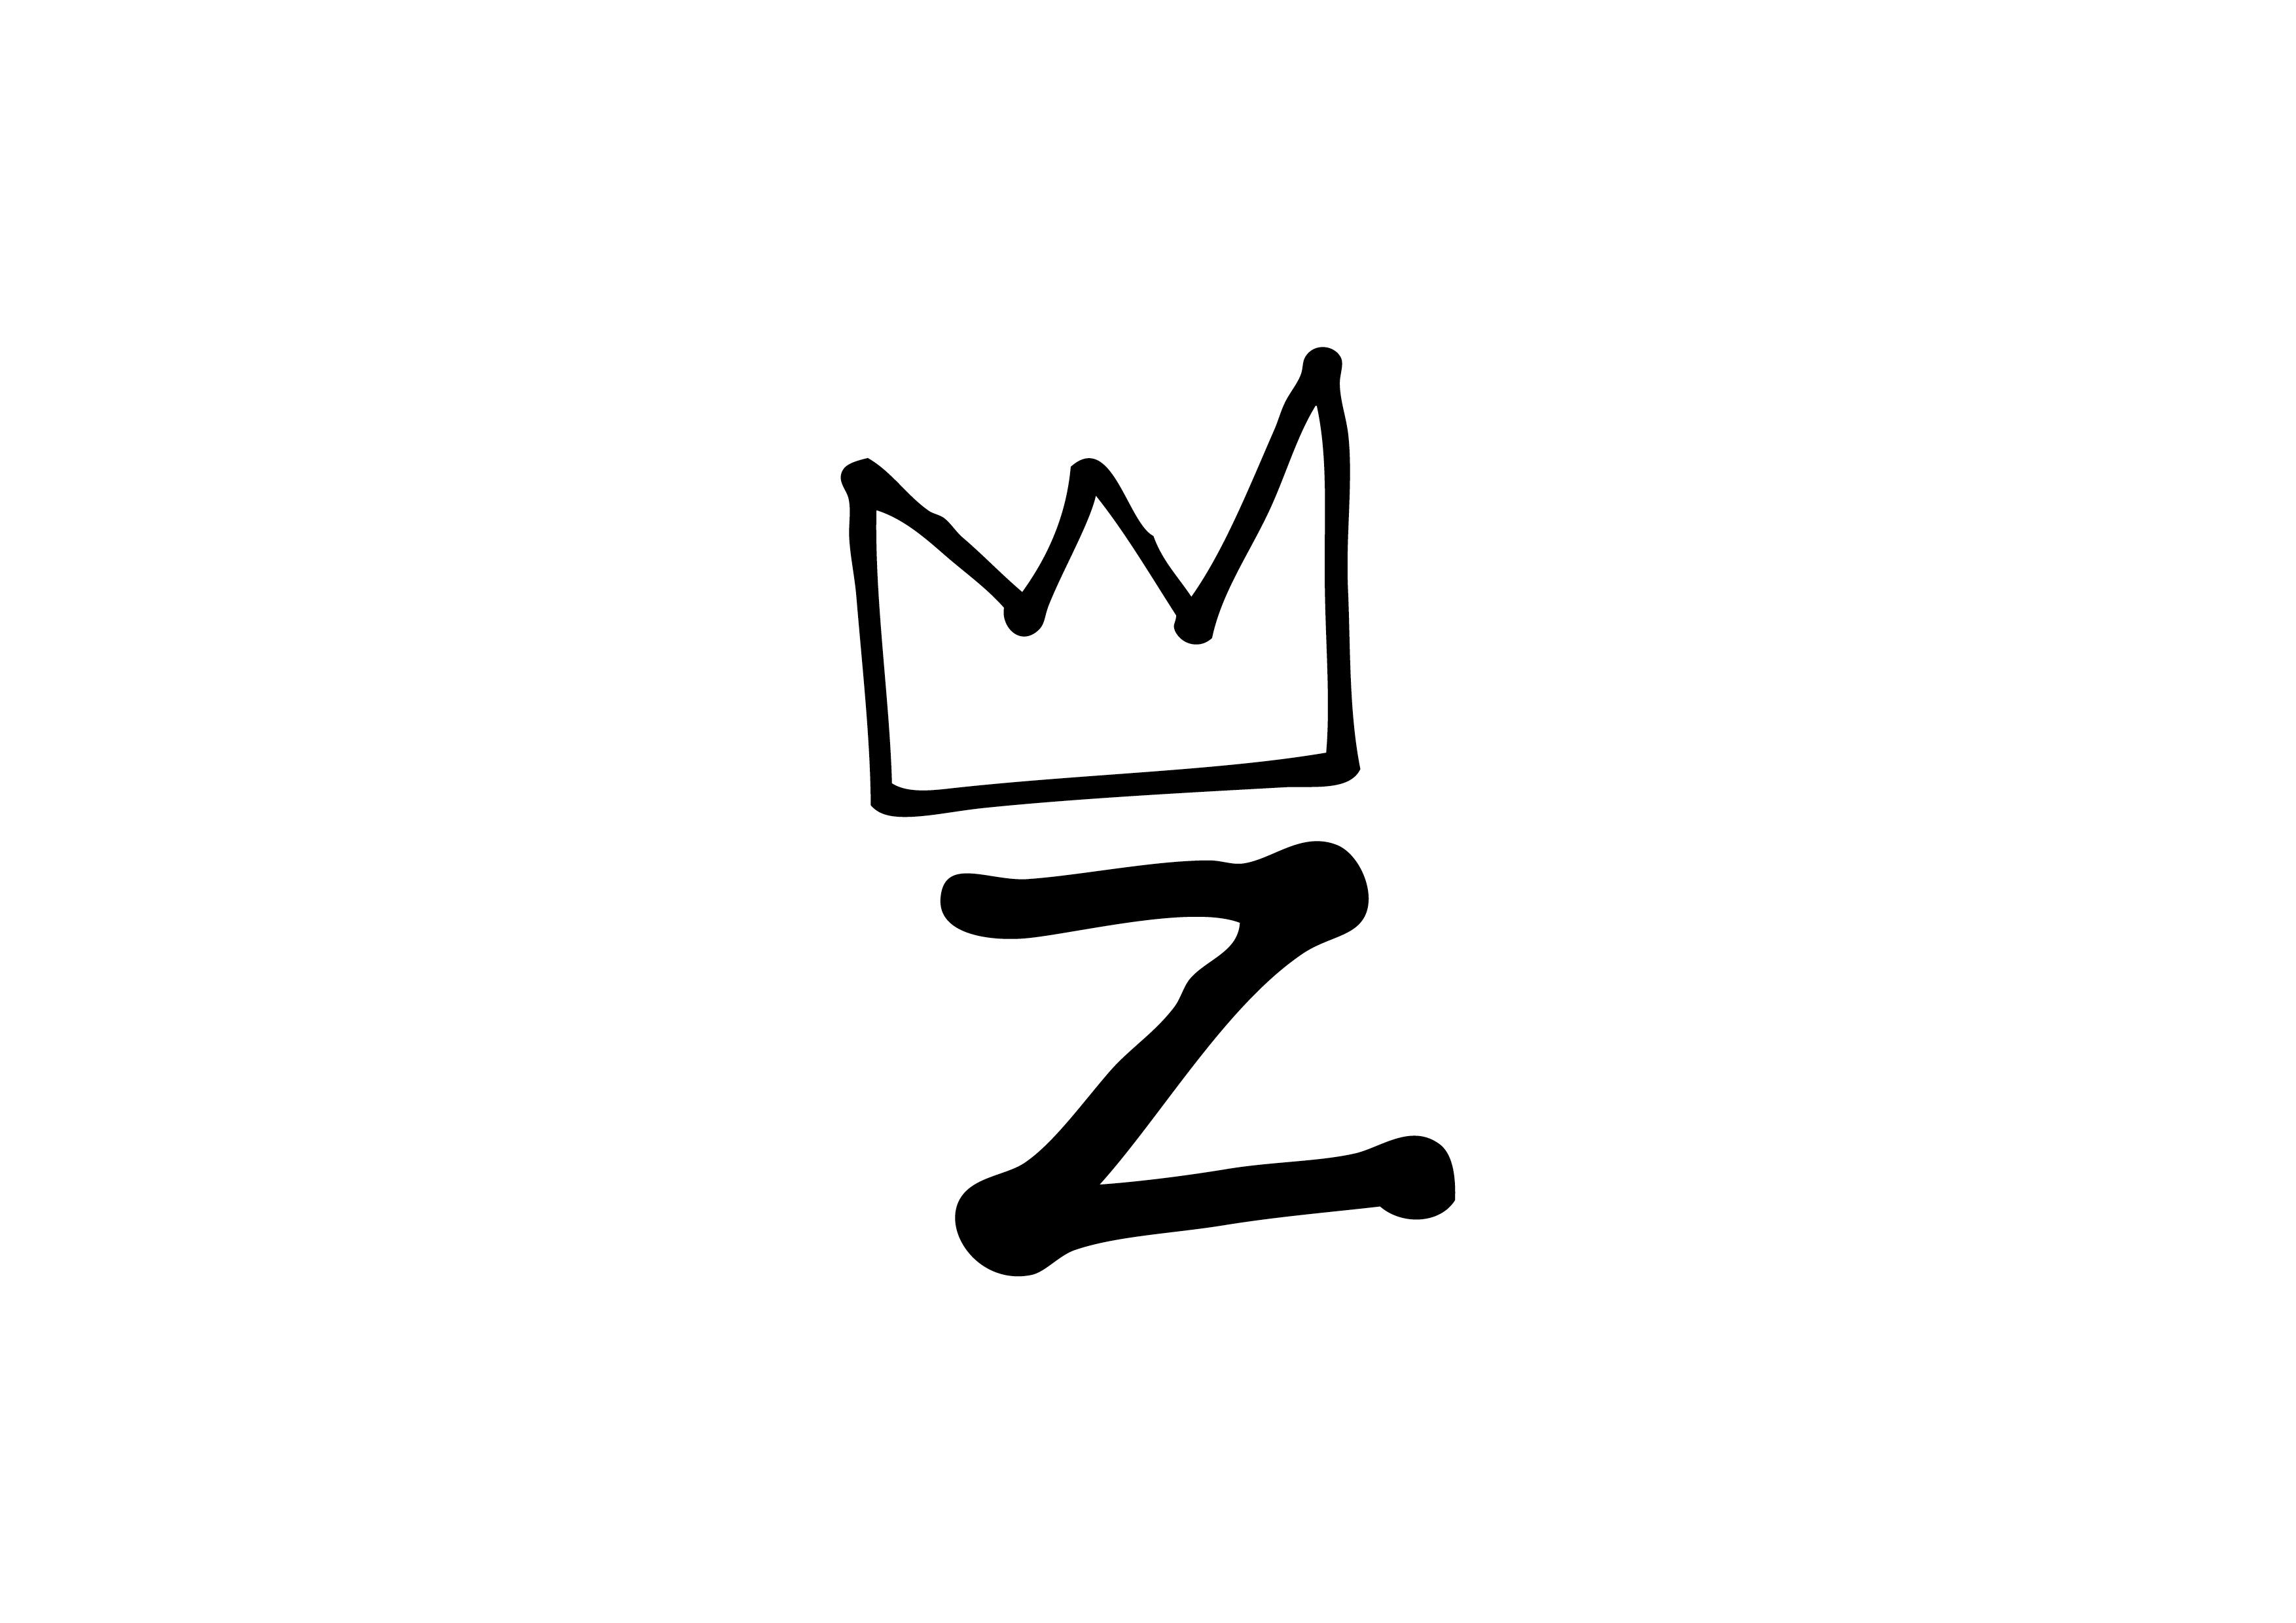 zed u201d children s clothing logo design everything design rh bycarmodydesign com Sunwear Logos Fashion Logos and Names